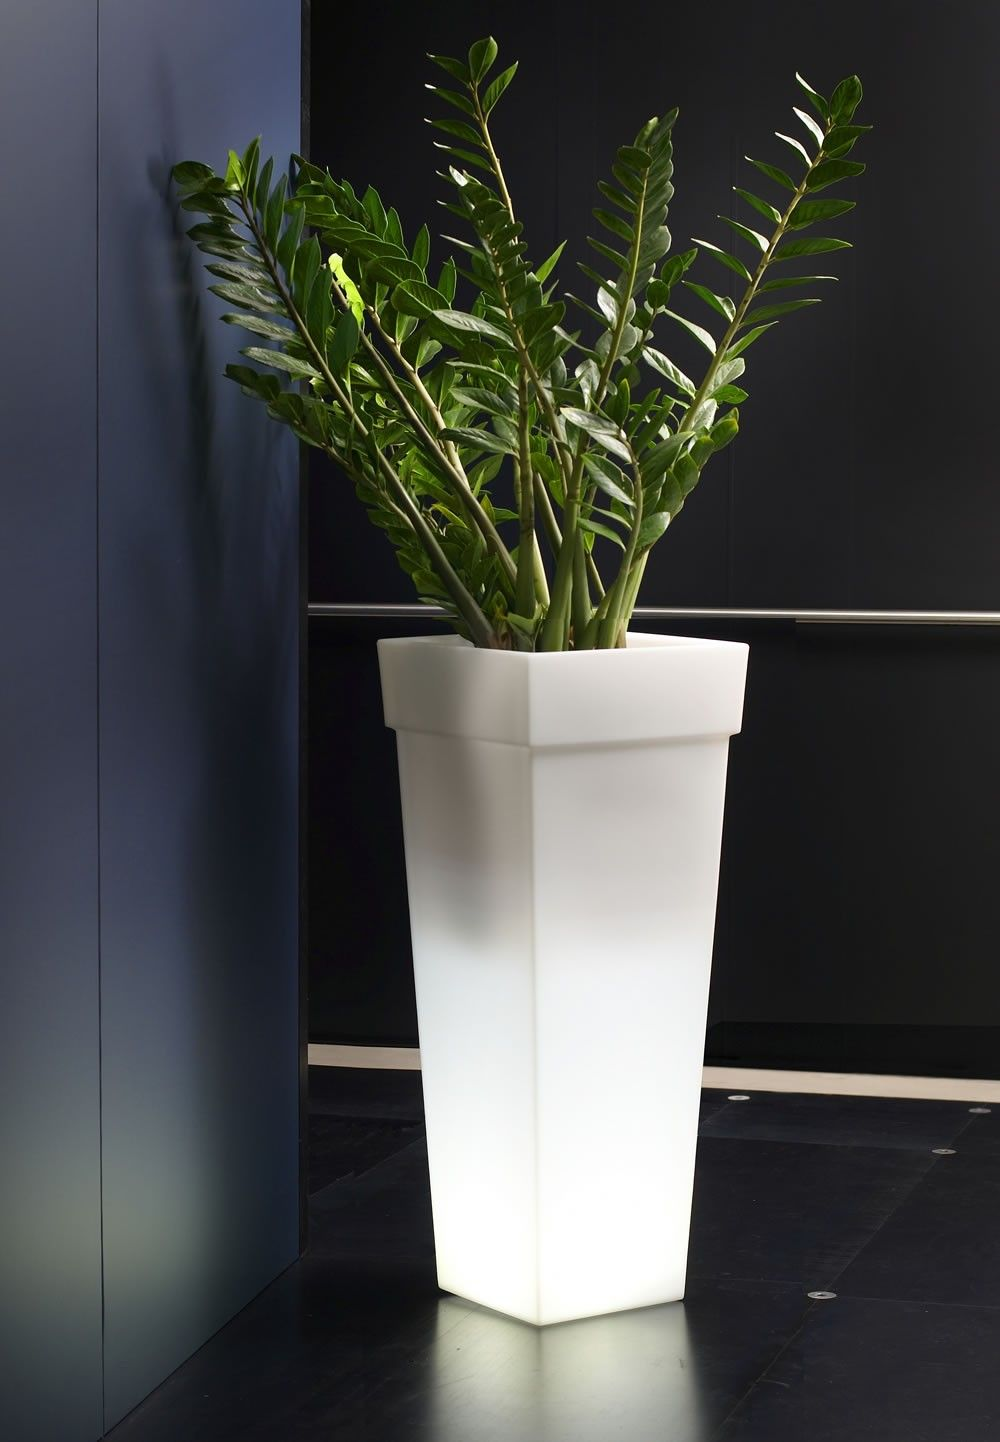 Vasi Per Piante Da Terrazzo vasi luminosi alti serie geryon con vasi alti da interno